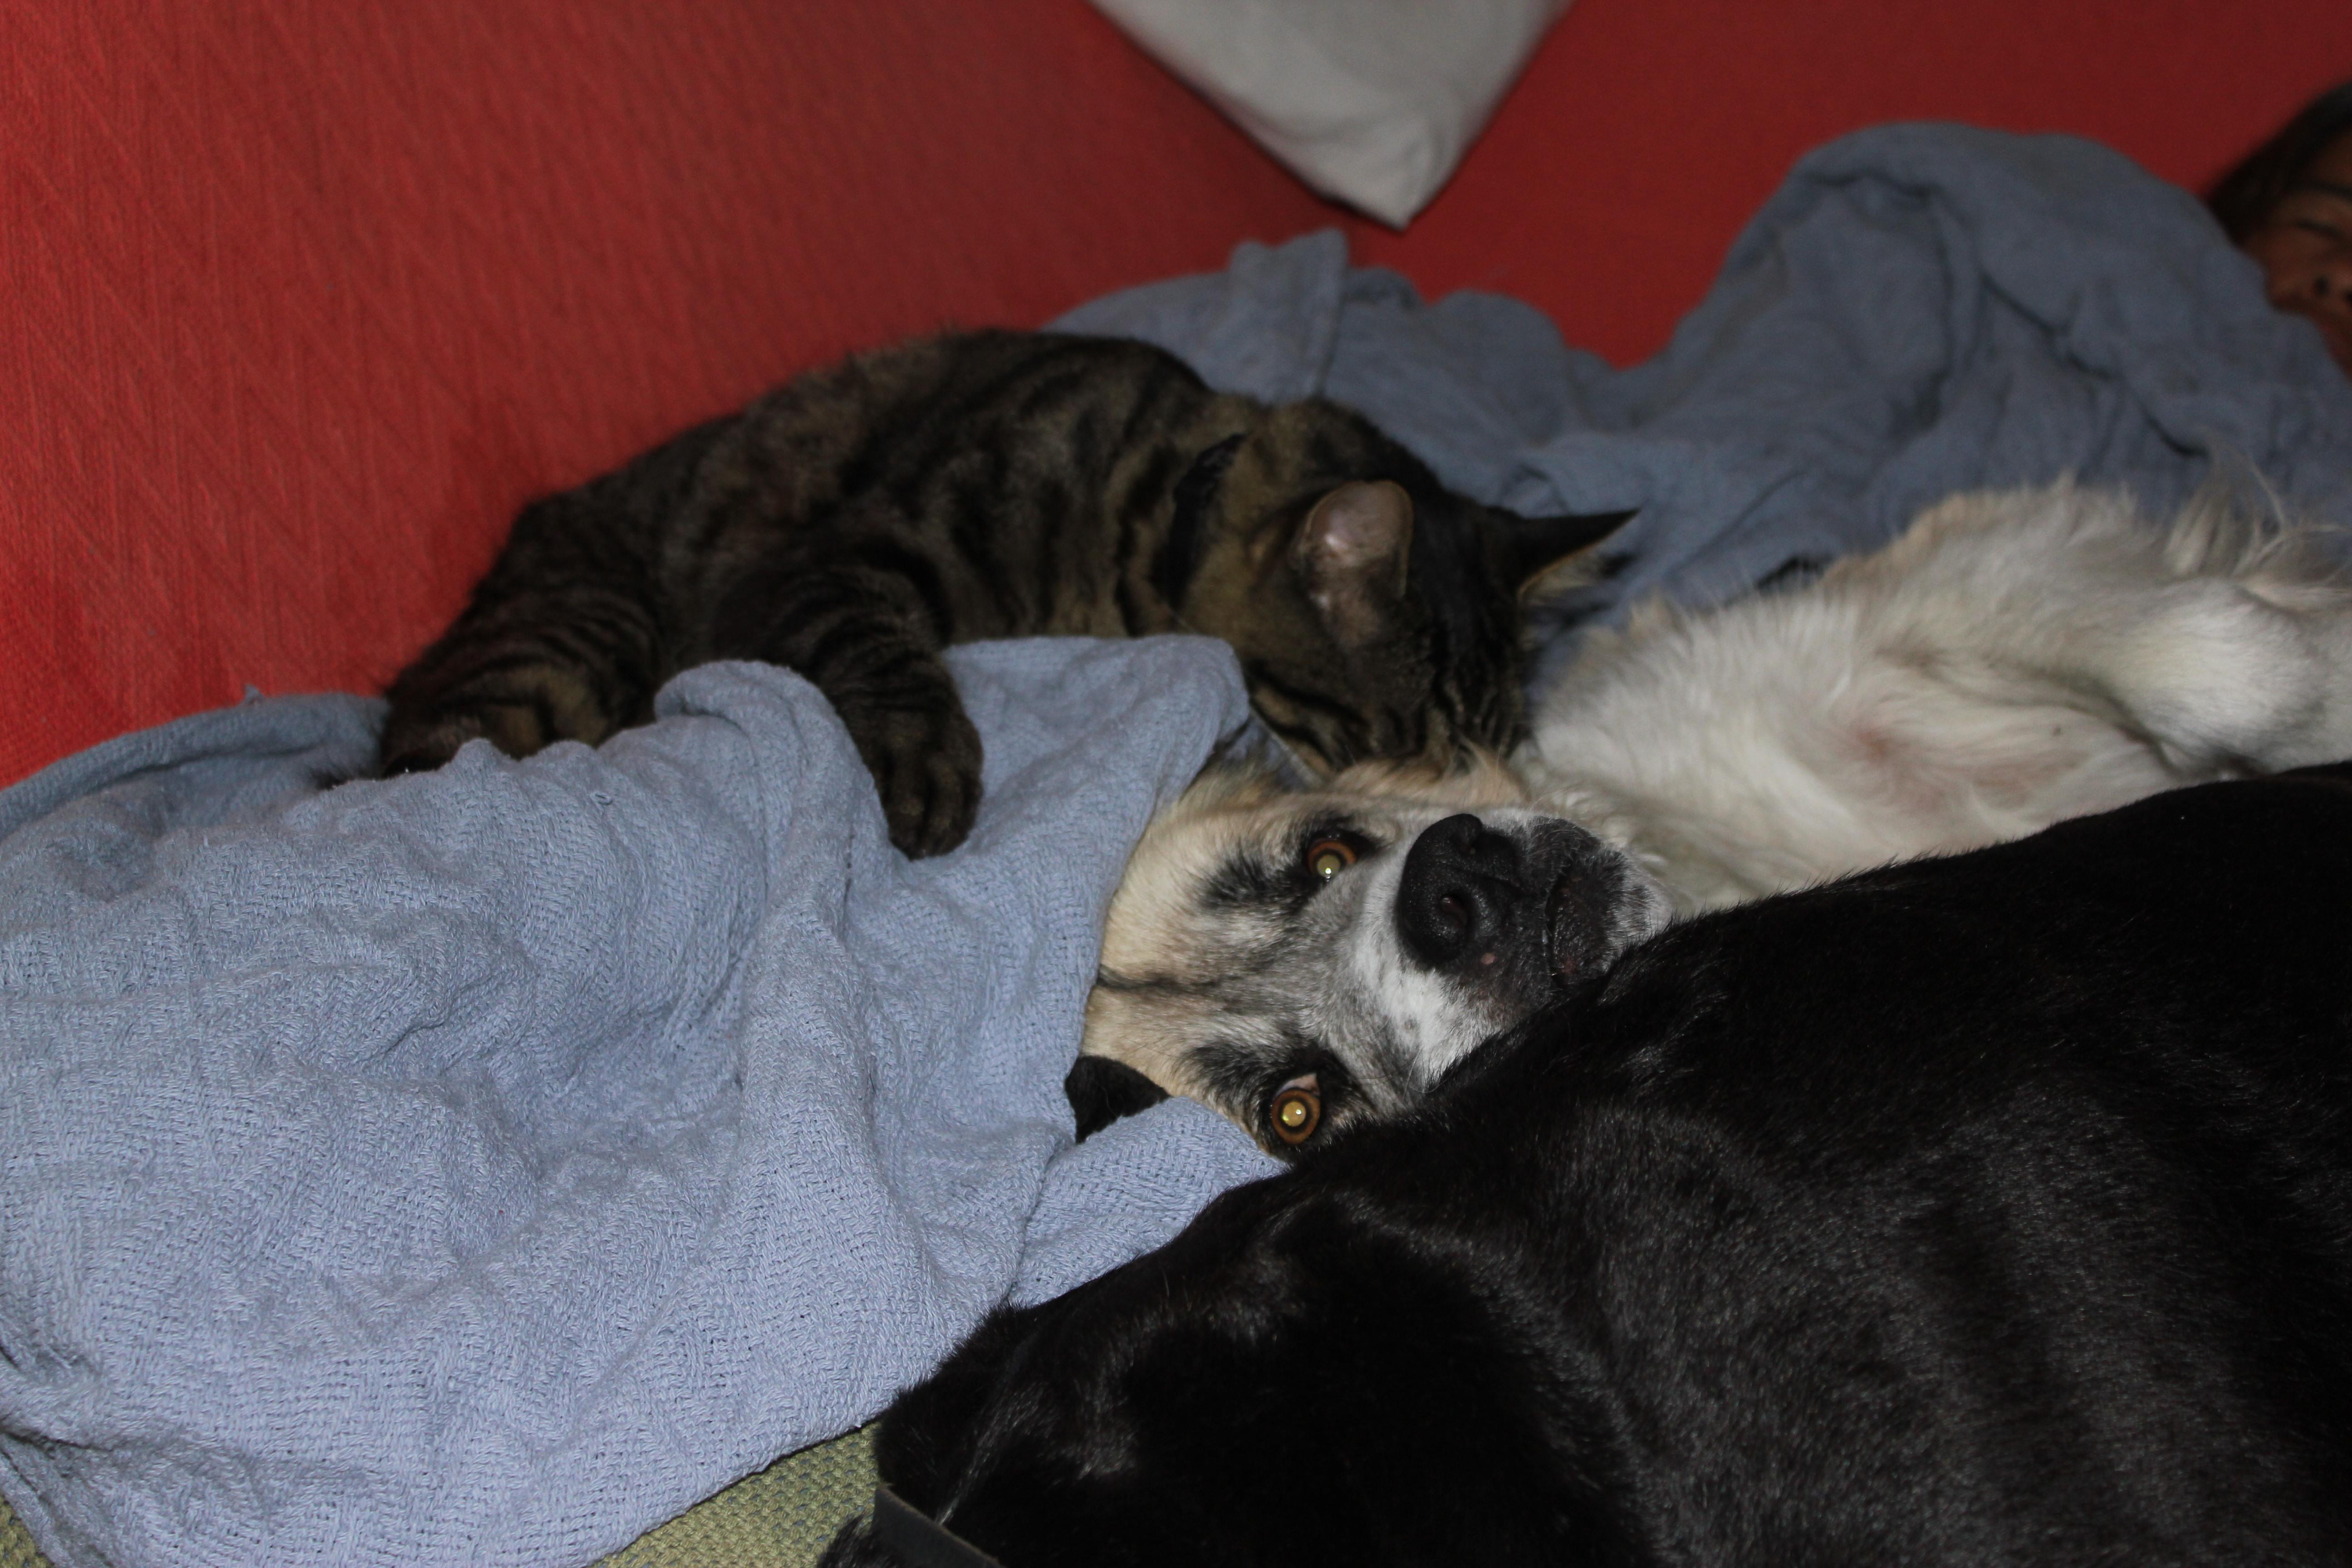 Herman babysitting Lebowski (the cat) and Stuey (the dog)